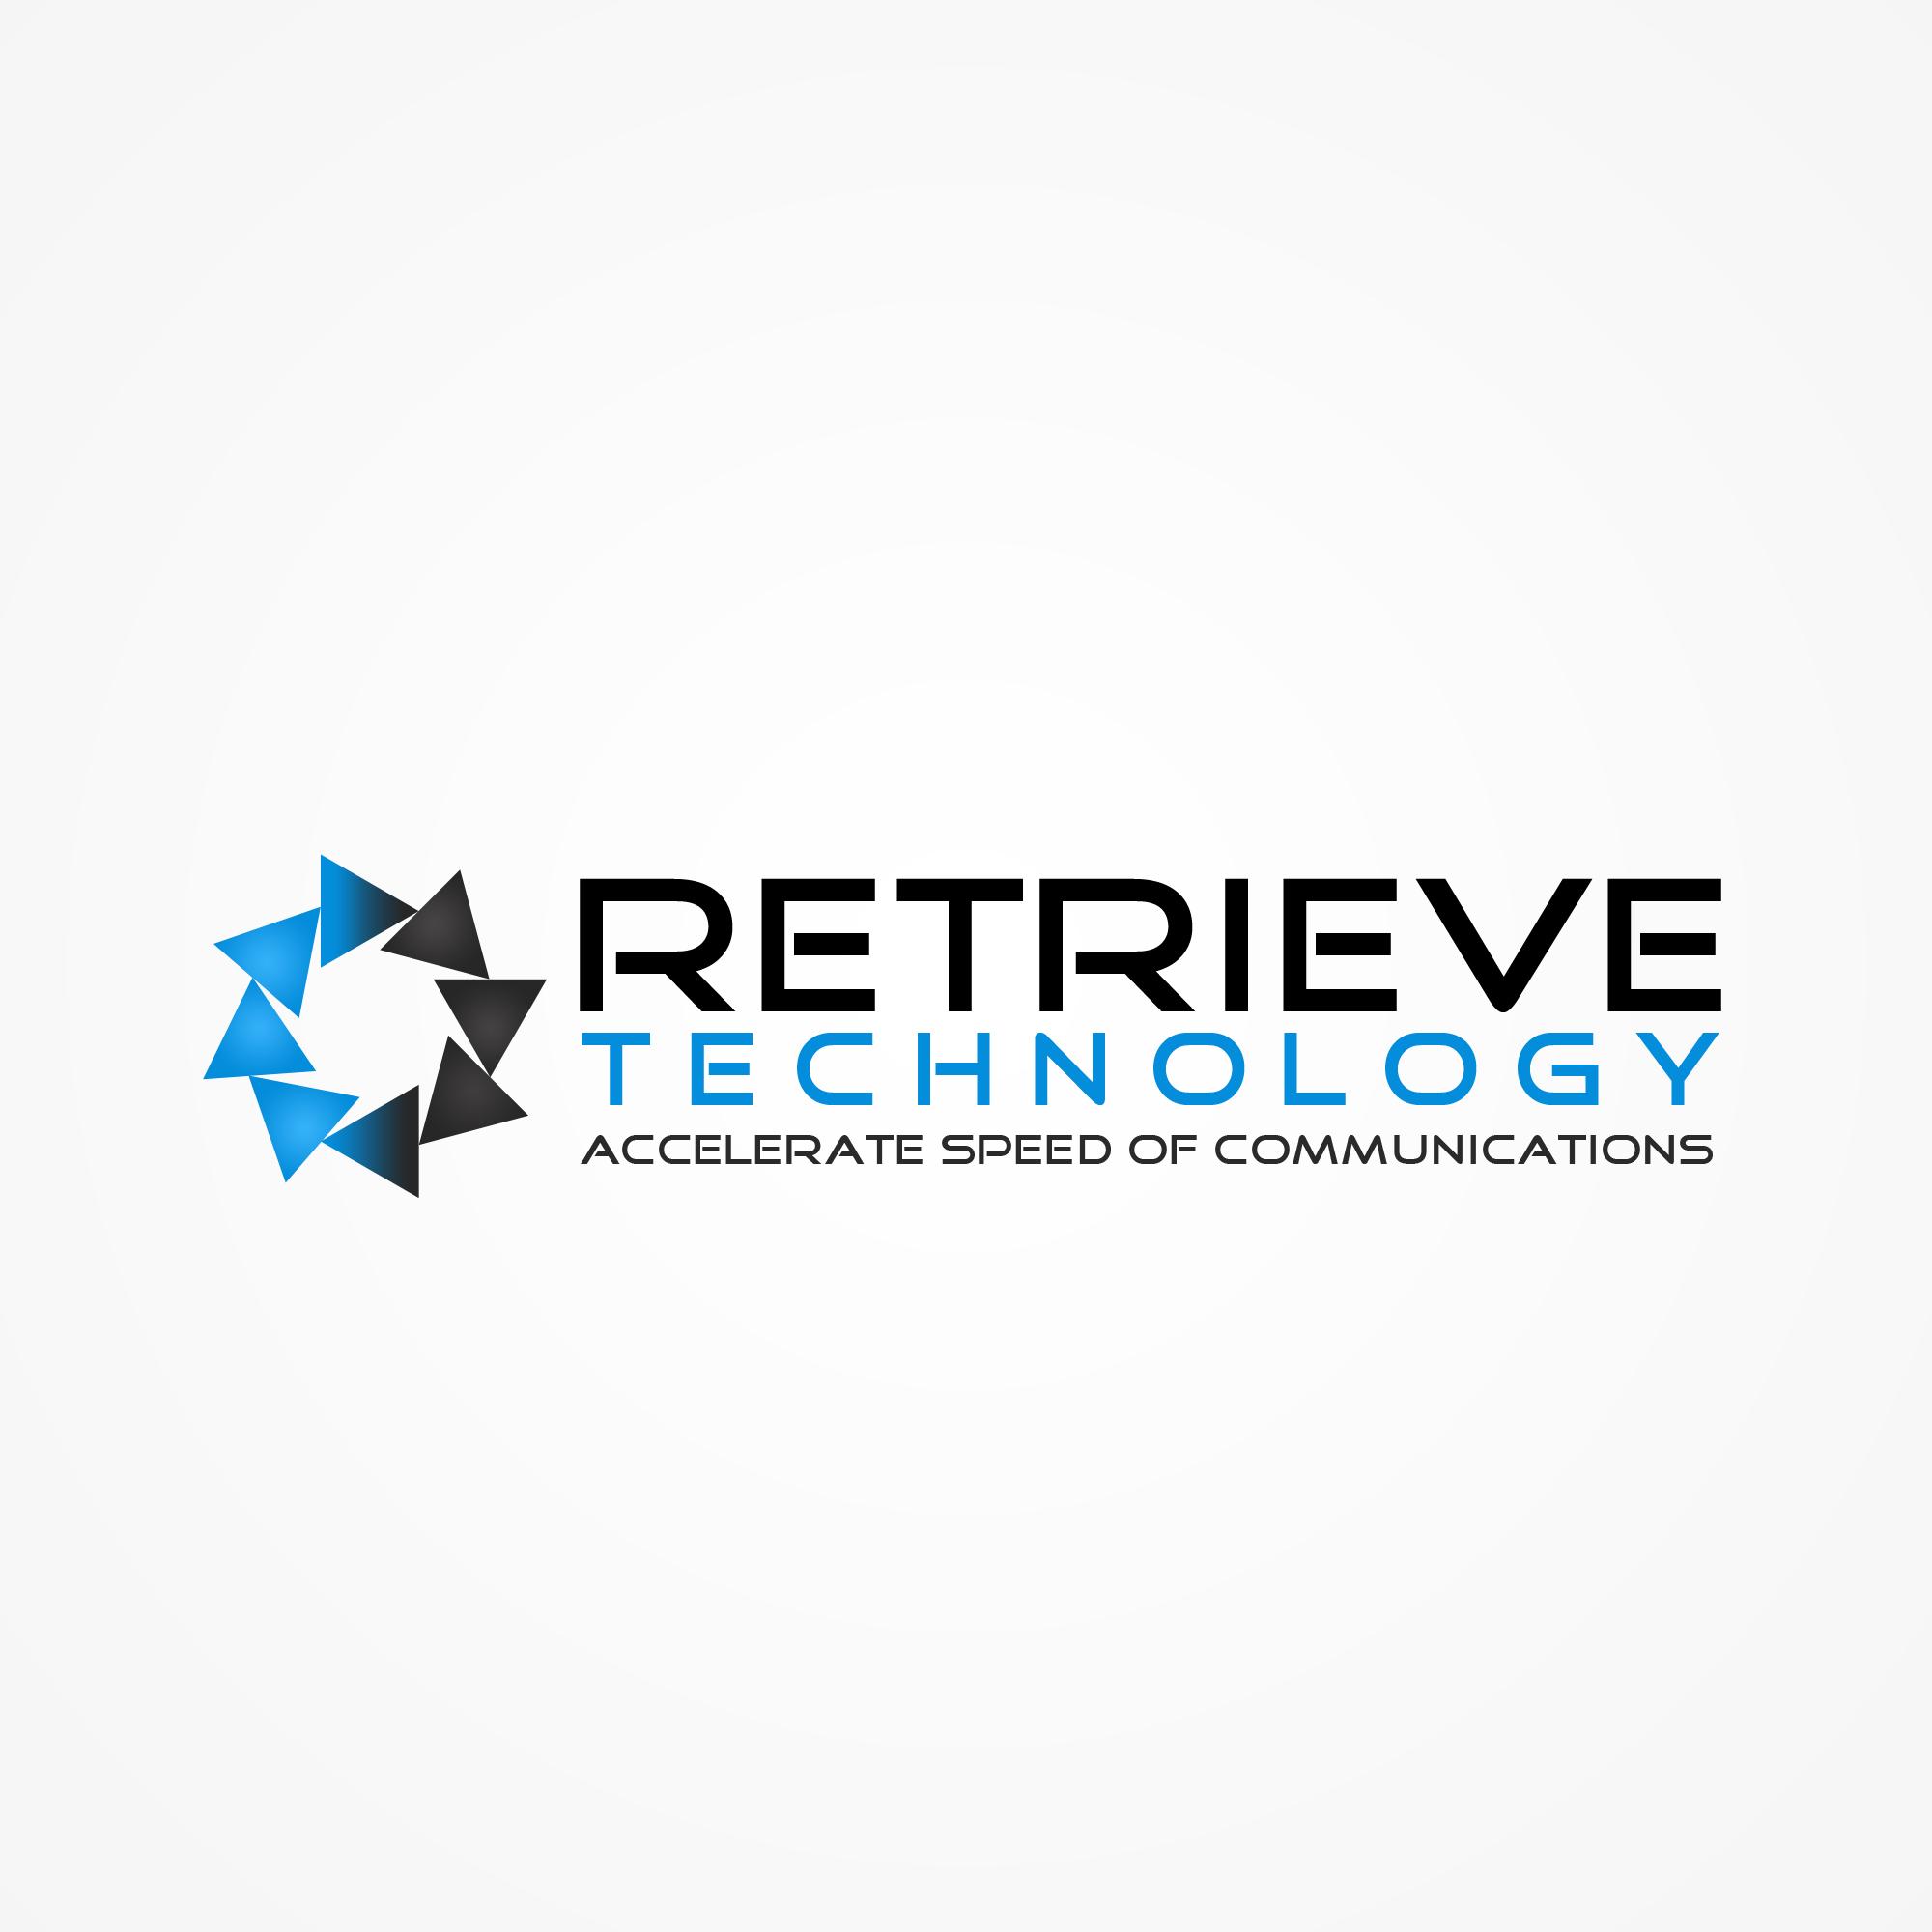 Logo Design by omARTist - Entry No. 76 in the Logo Design Contest Artistic Logo Design for Retrieve Technologies.